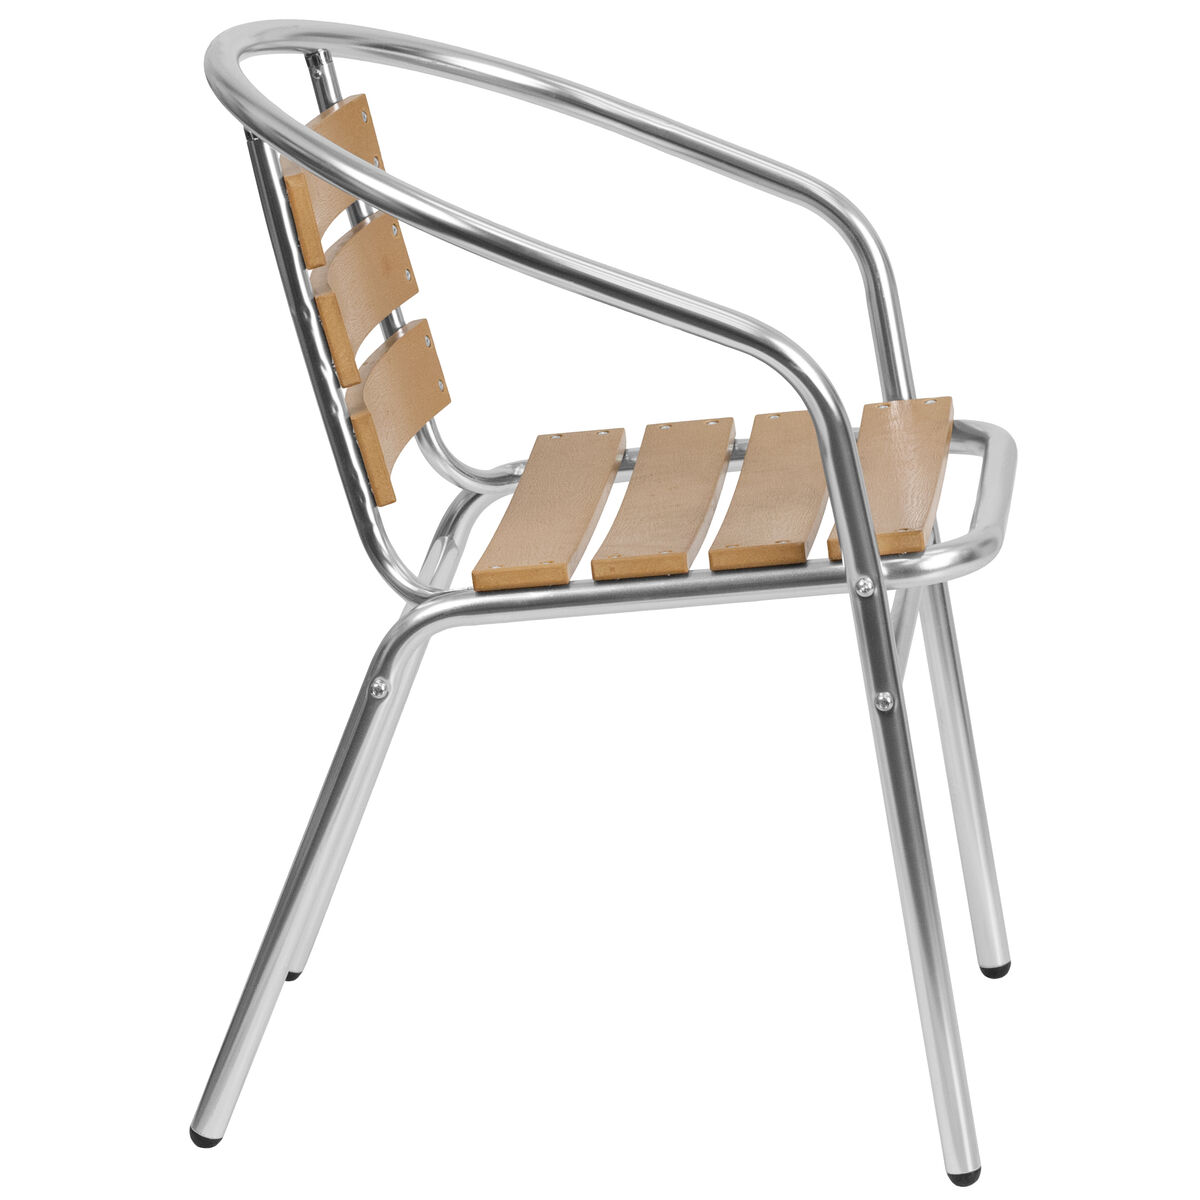 Furniture For Less Miami: Aluminum Teak Back Chair TLH-017W-GG